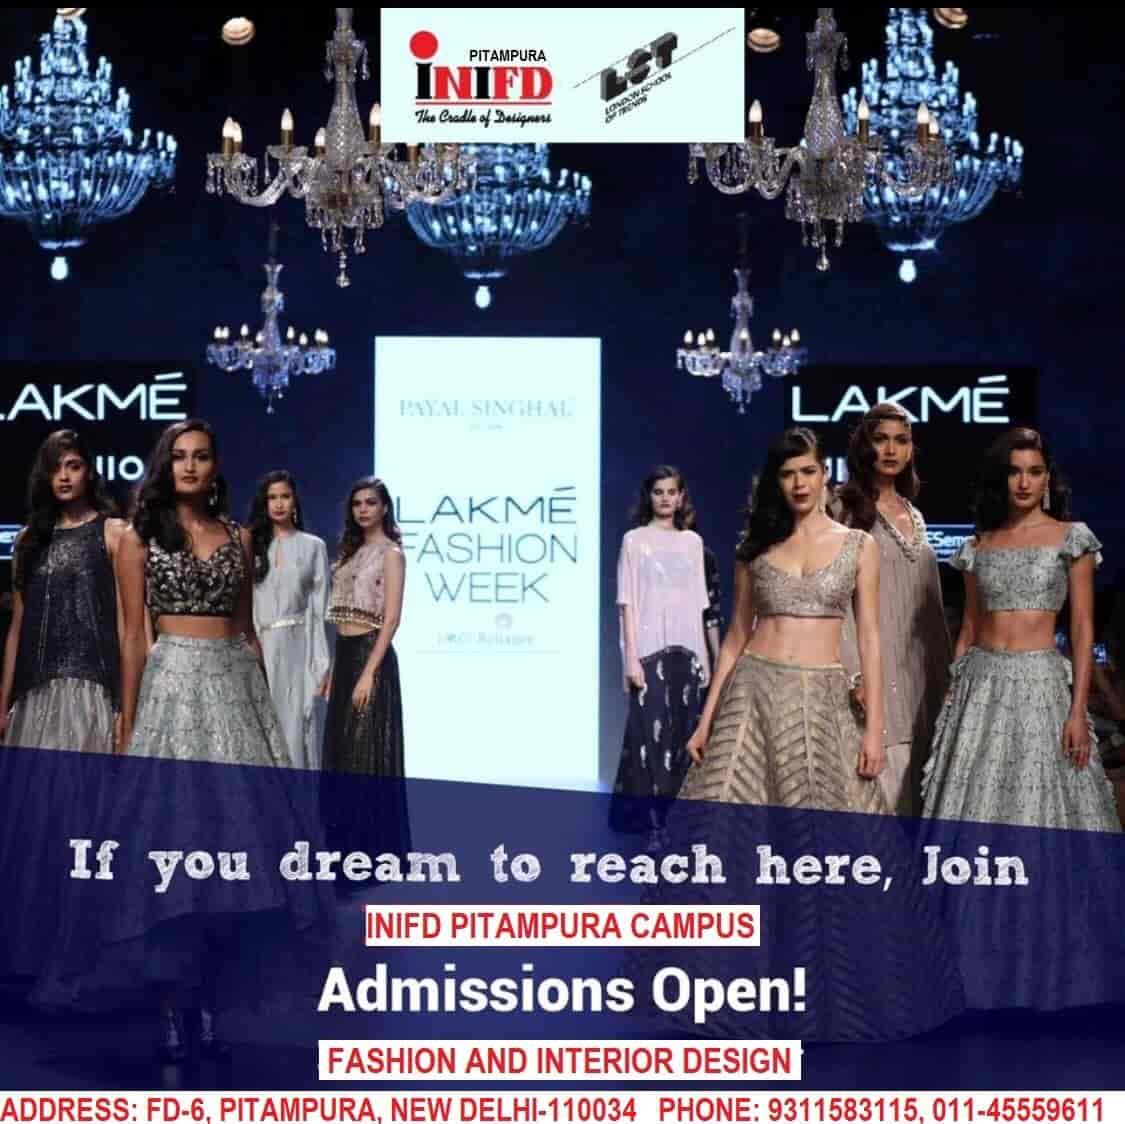 Inifd Pitampura Fashion Designing Institutes In Delhi Justdial